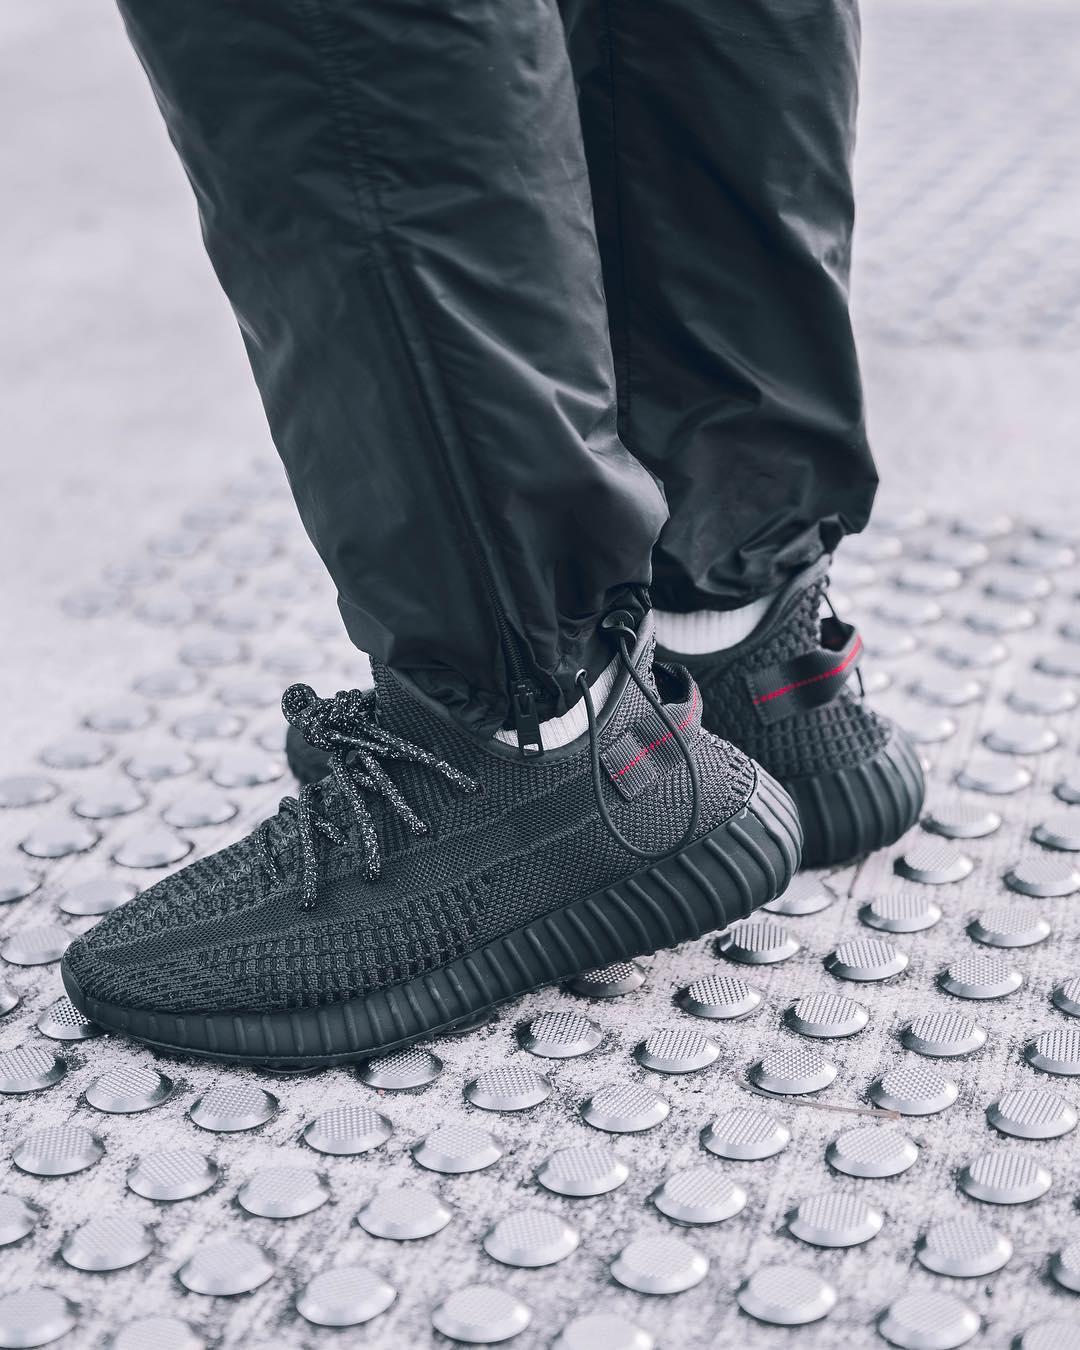 De All Black adidas YEEZY BOOST 350 V2 released 8 juni